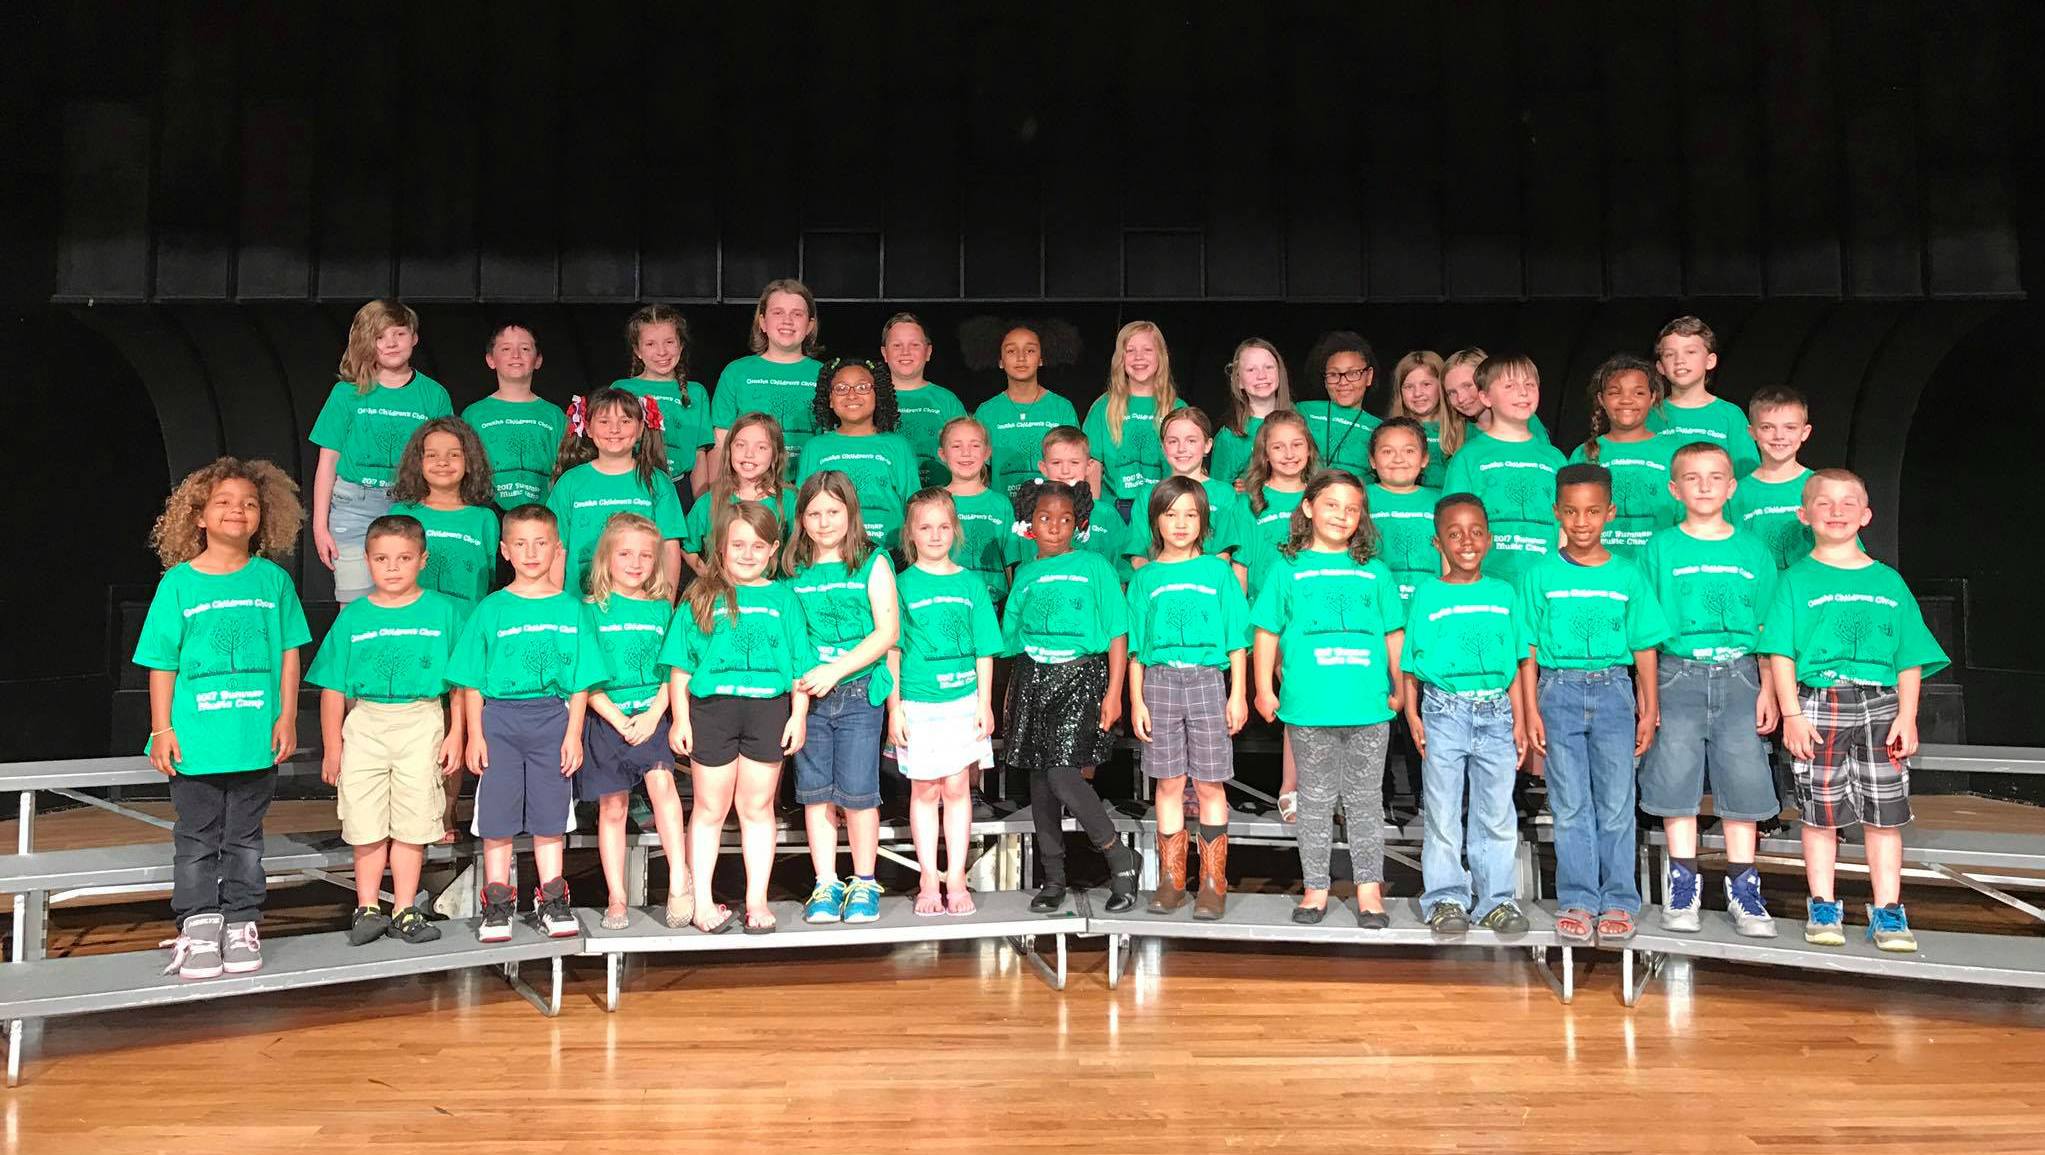 Omaha Childrens Choir 2